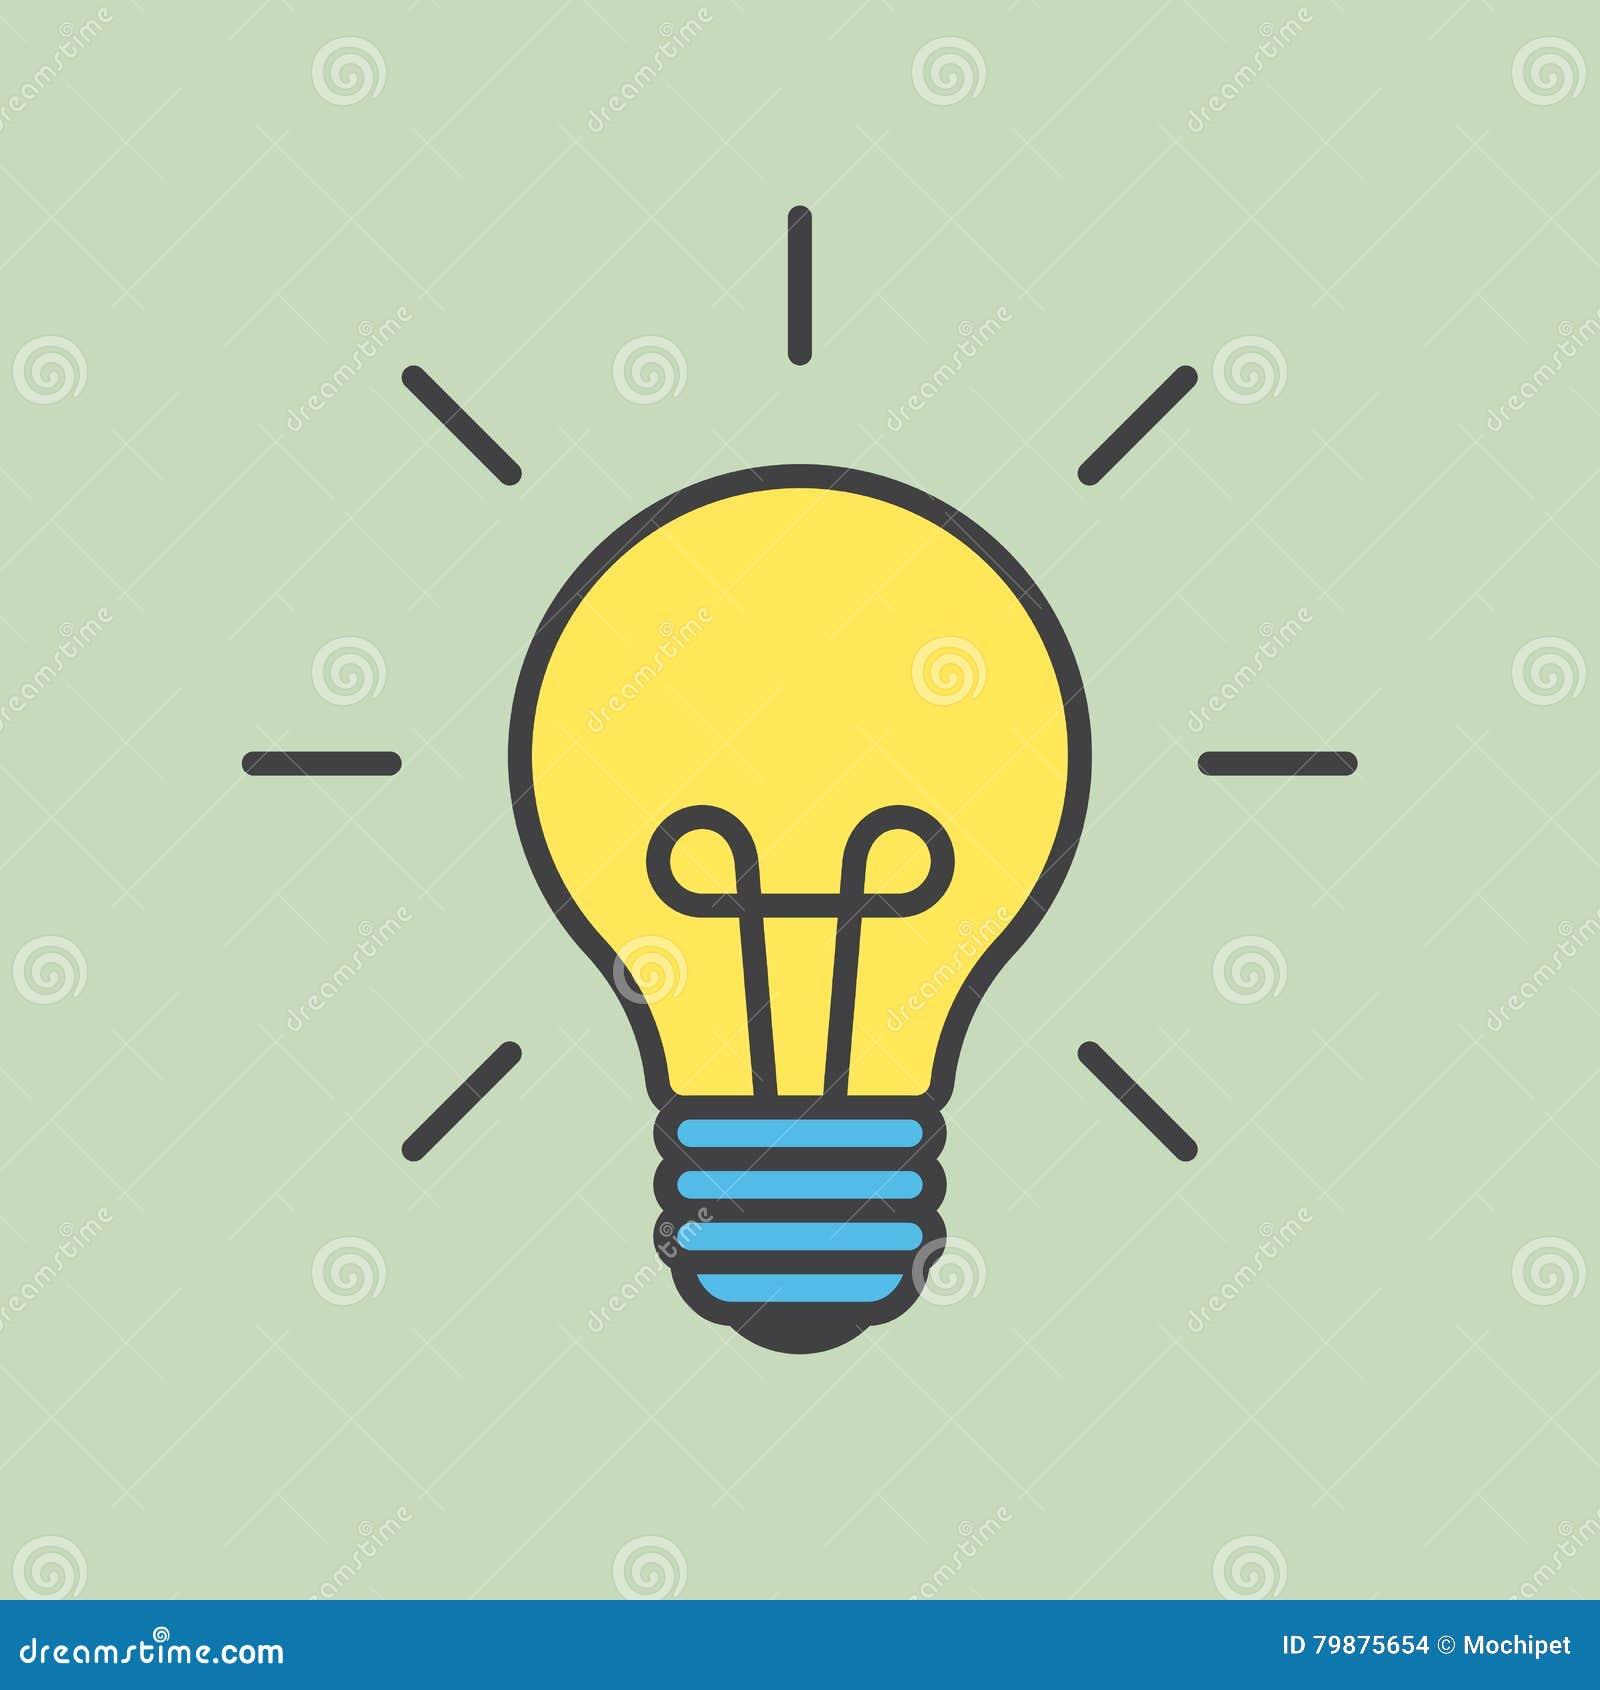 Cartoon light bulb with contour